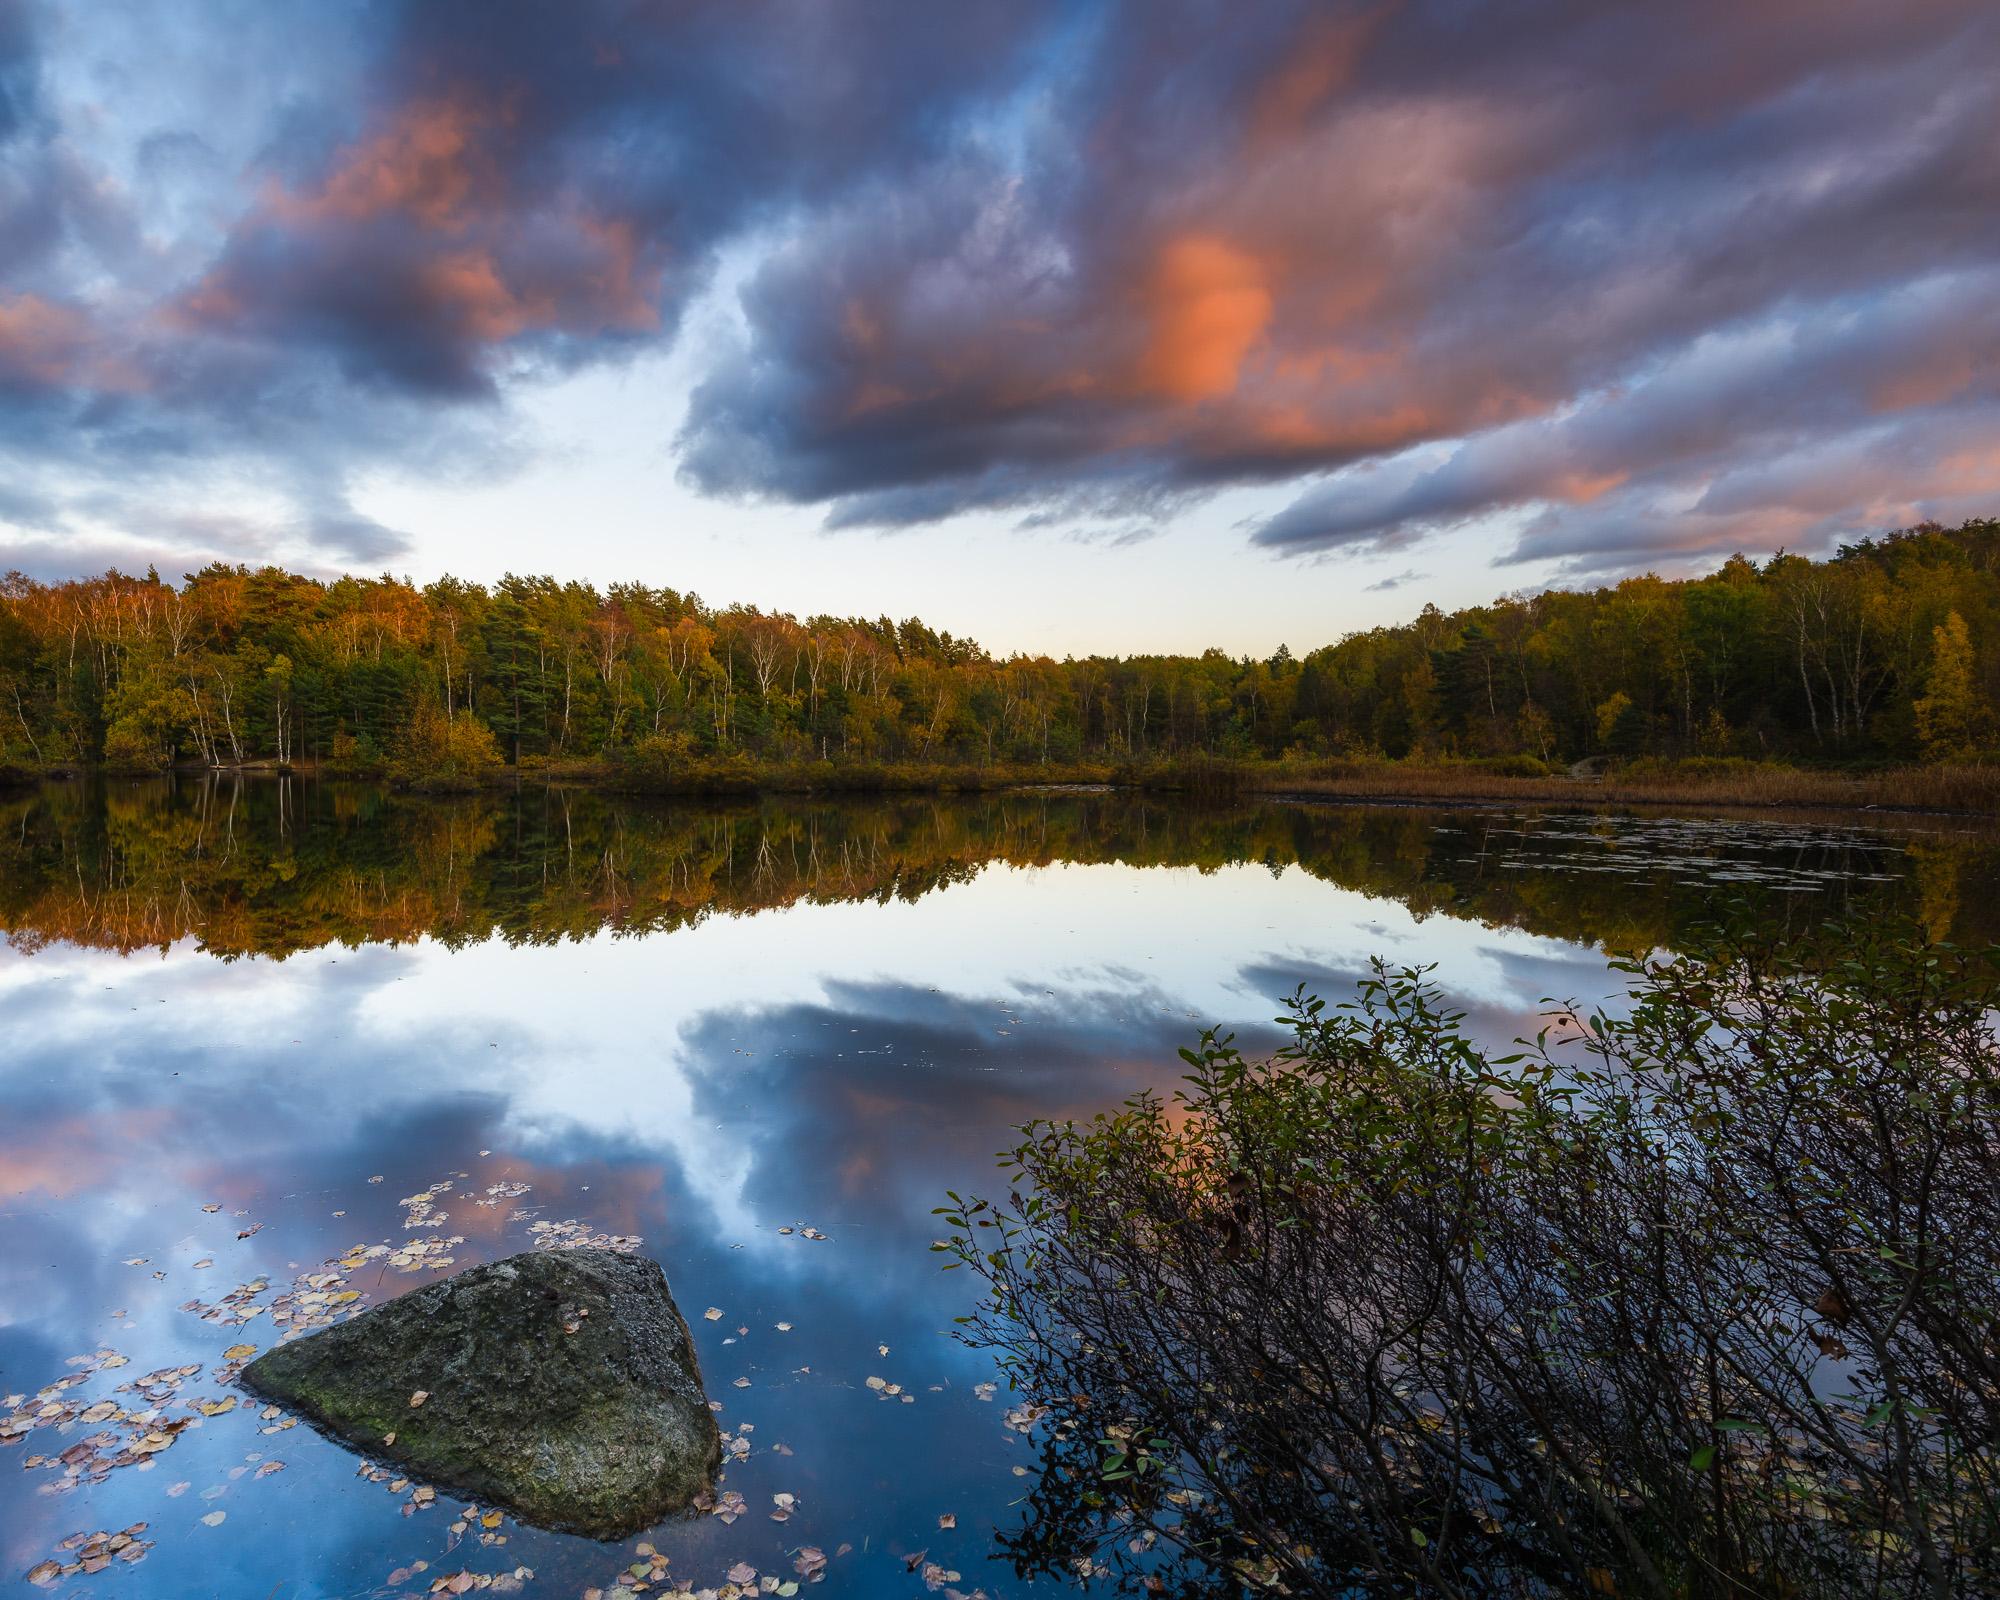 Änggårdsbergen Naturreservat, Göteborg